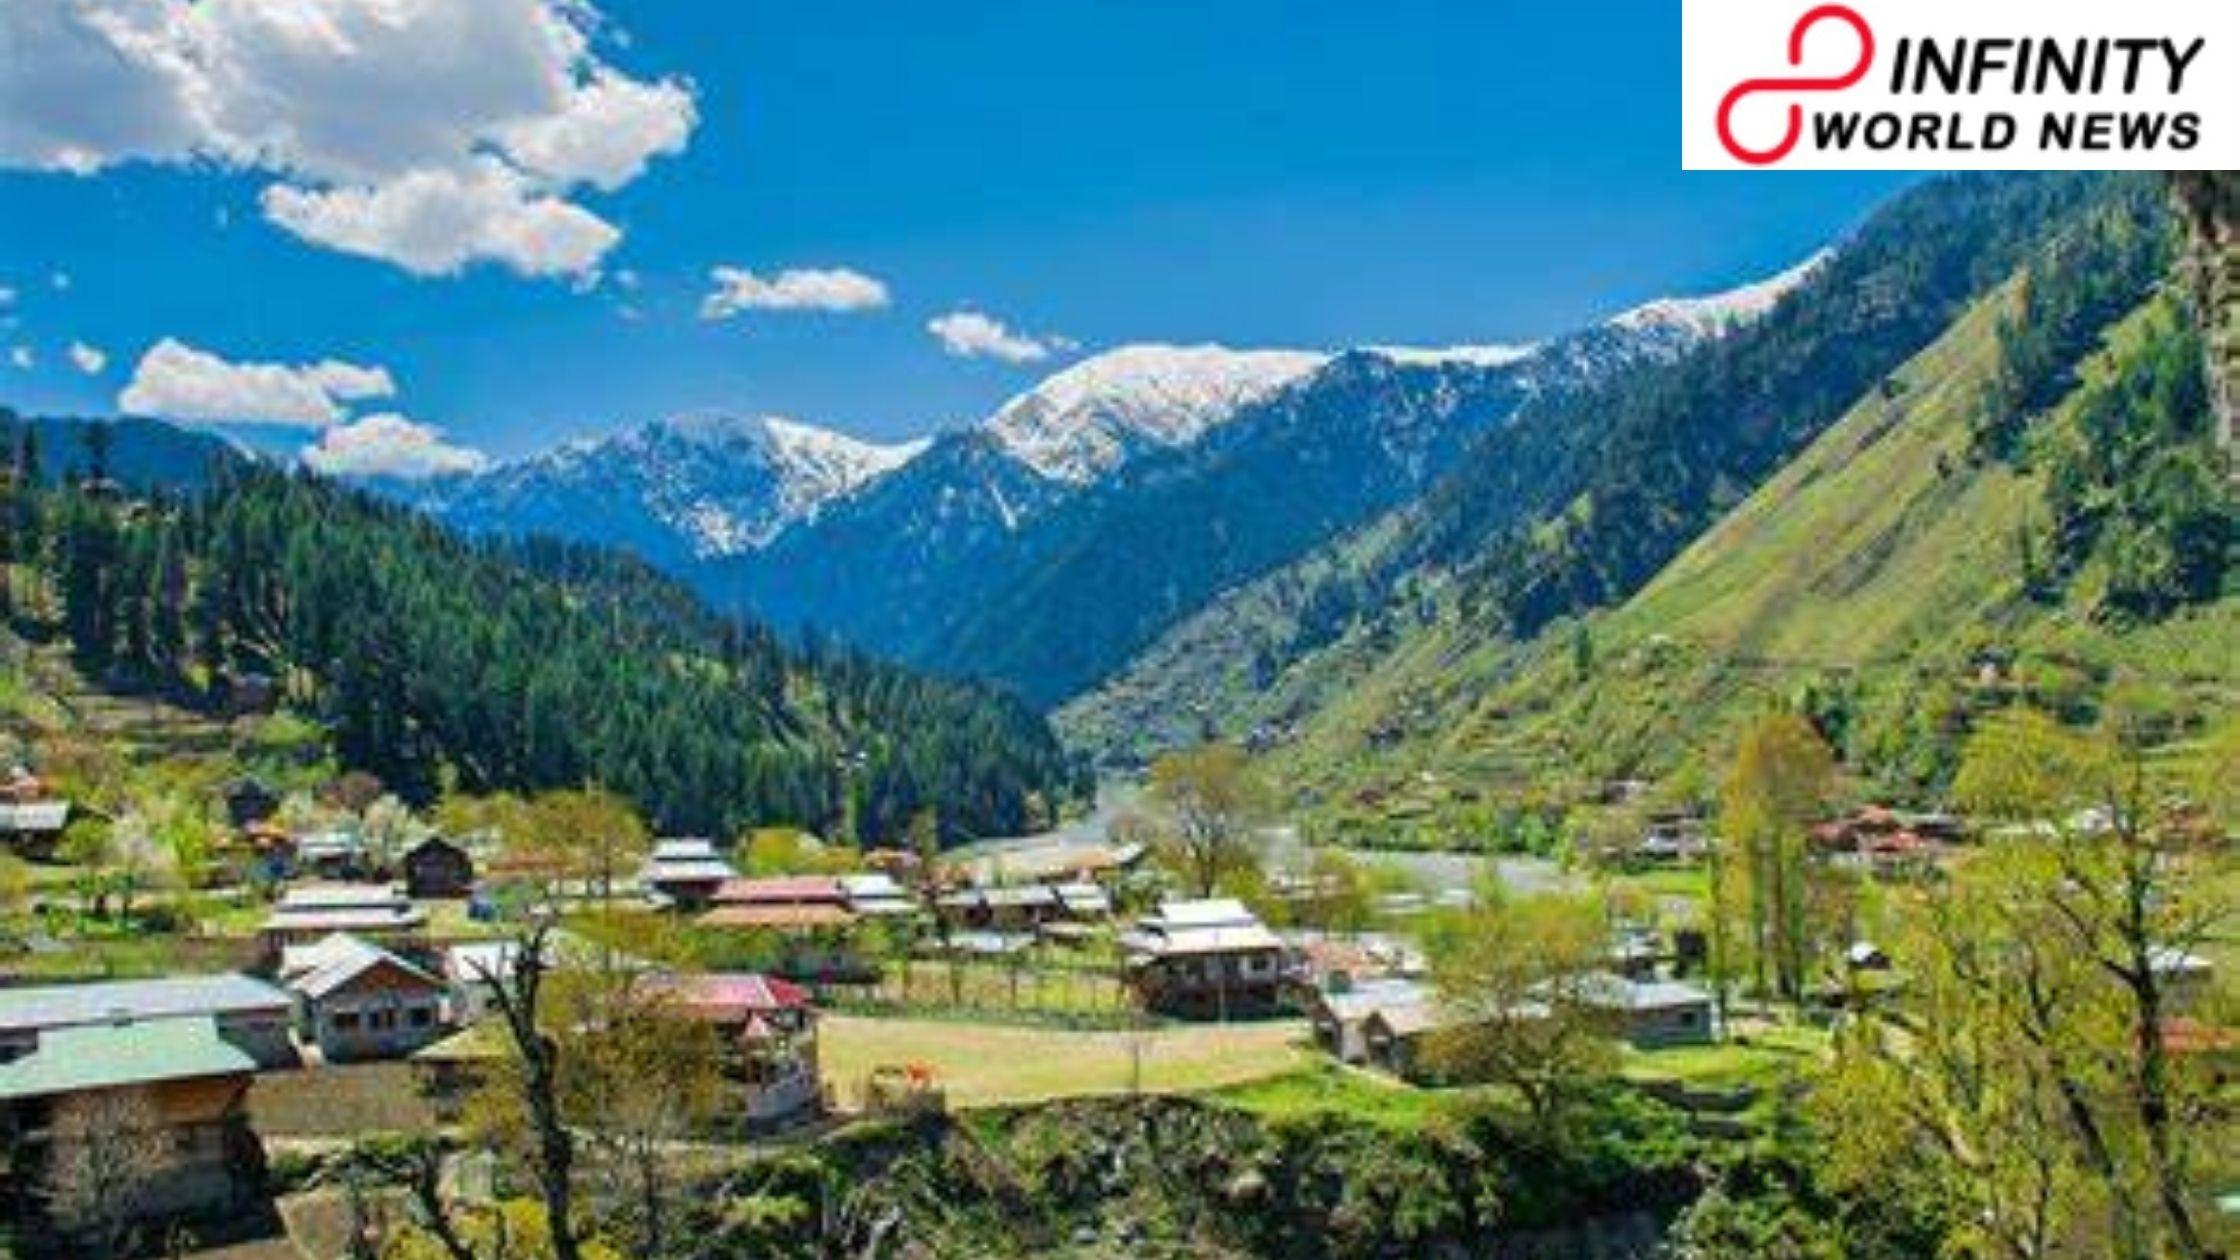 Torrential slide Warnings Issued in Jammu and Kashmir, Ladakh